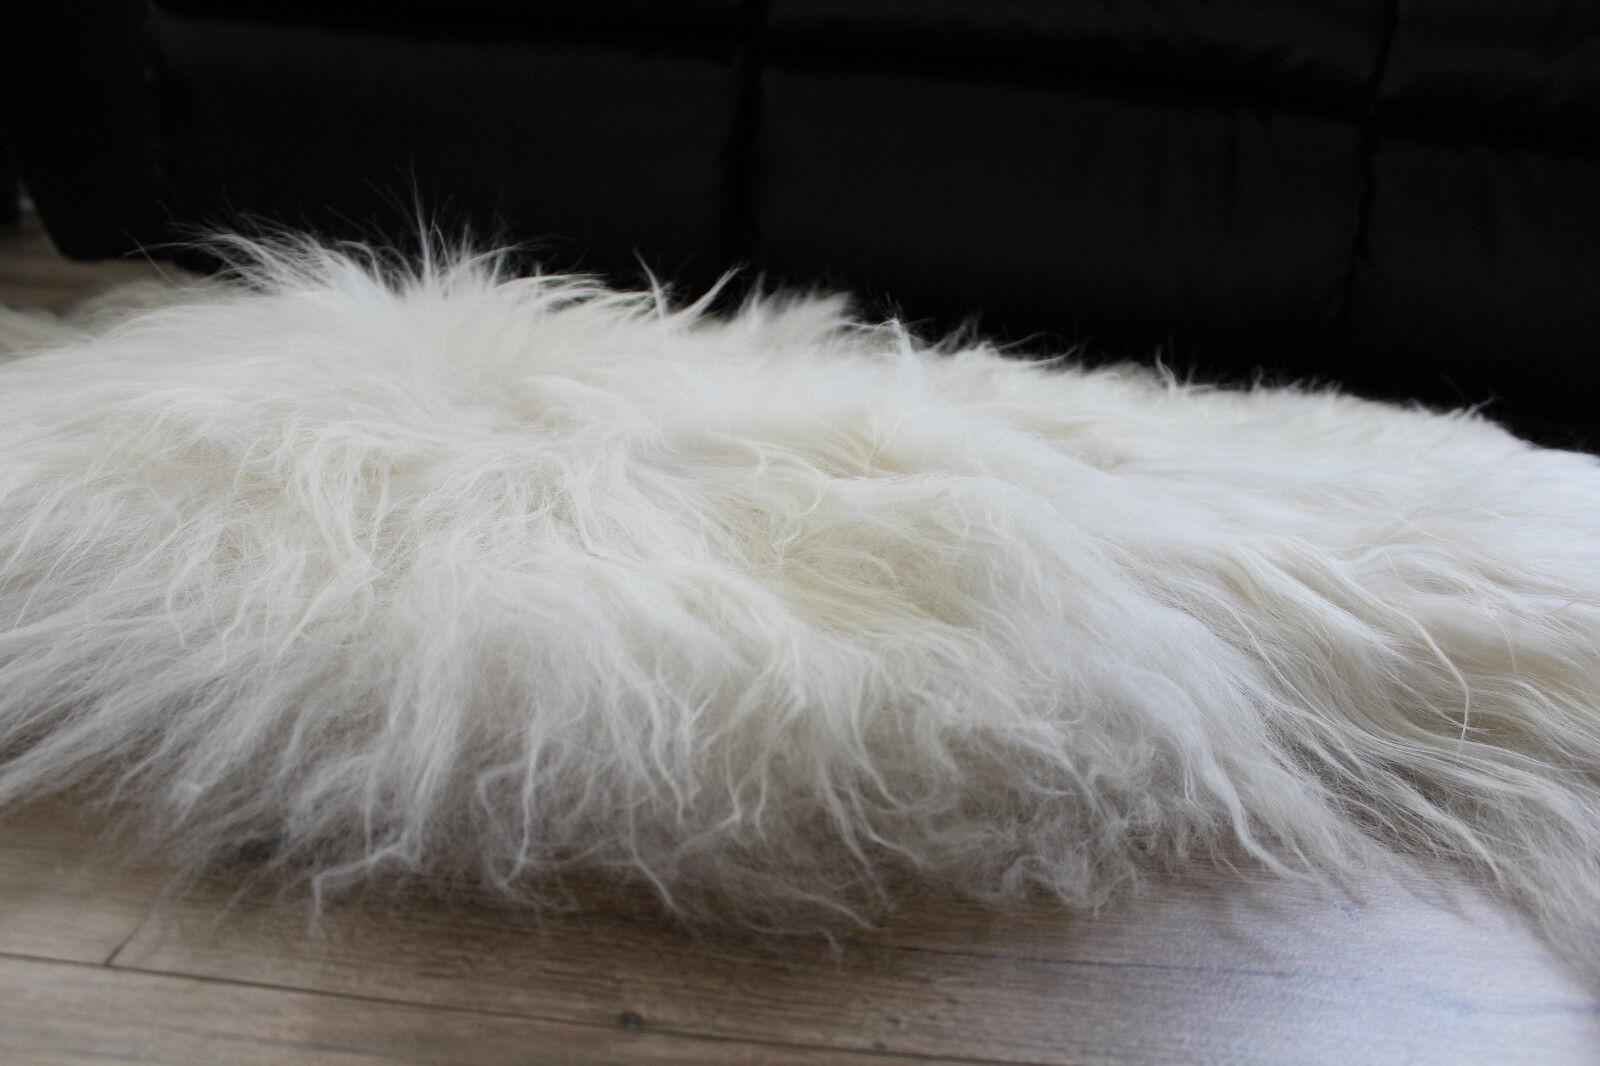 Genuine Icelandic Icelandic Icelandic Sheepskin Rug Throw – shade of Weiß e3d83c